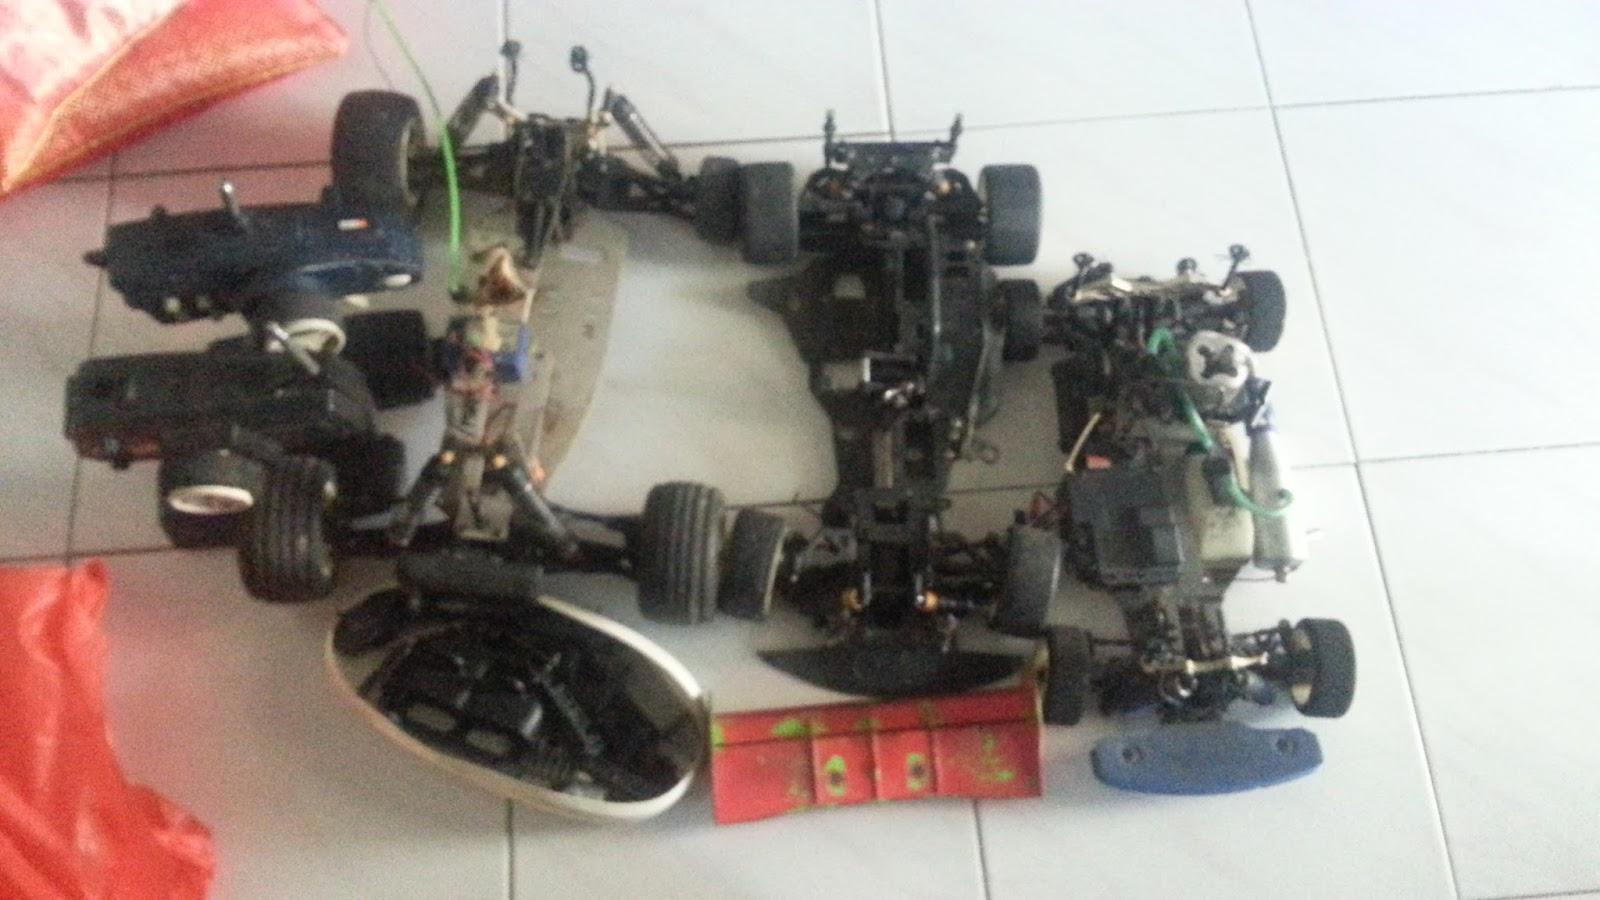 Wpl C24 Diy Radio Controlled Cars Off Road Rc Car Parts 1 16 Crawler